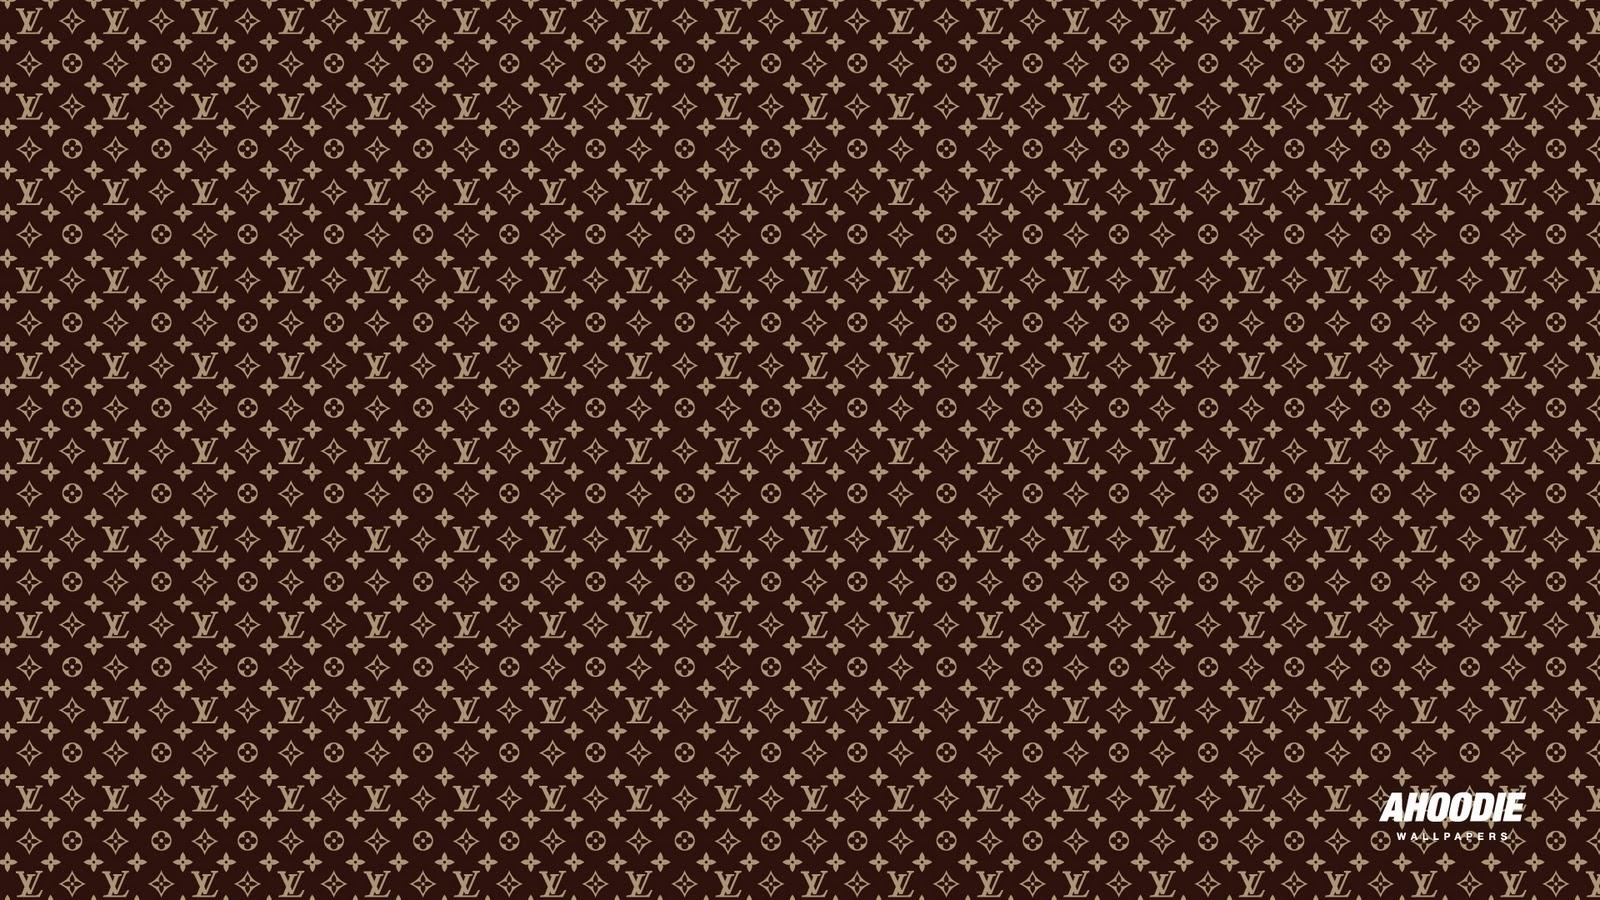 mashababko: Louis Vuitton Wallpaper